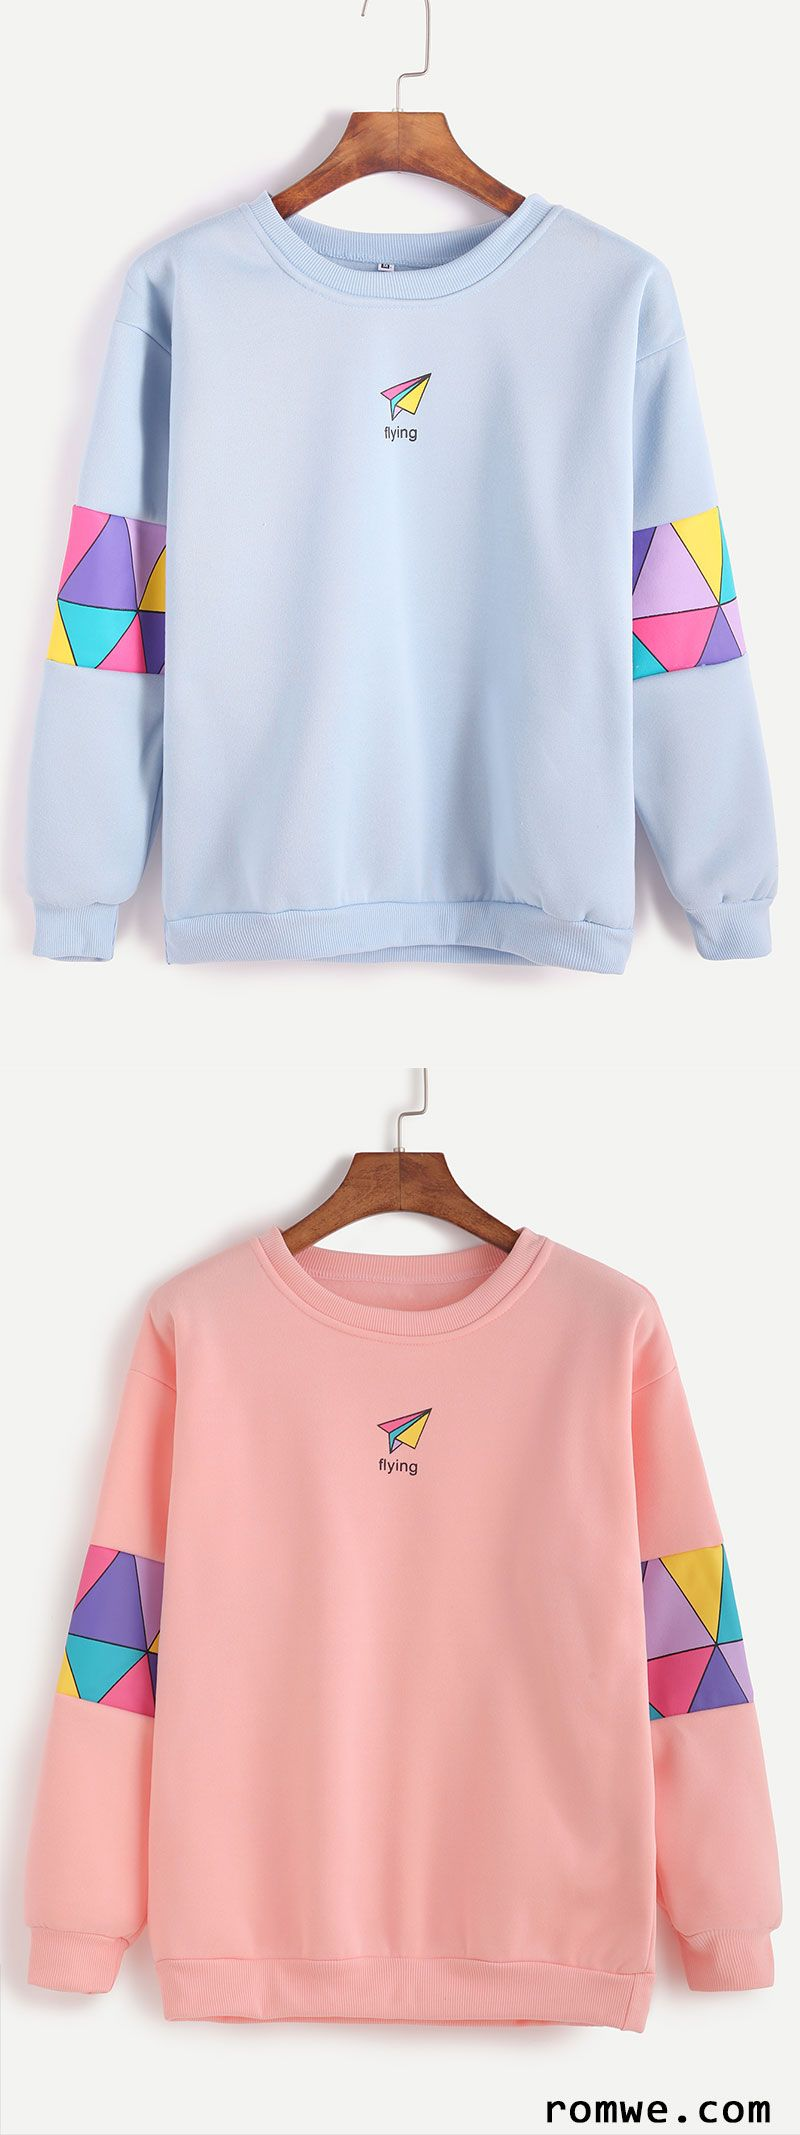 Pink & Blue Patchwork Print Sweatshirt from romwe.com | Romwe ...